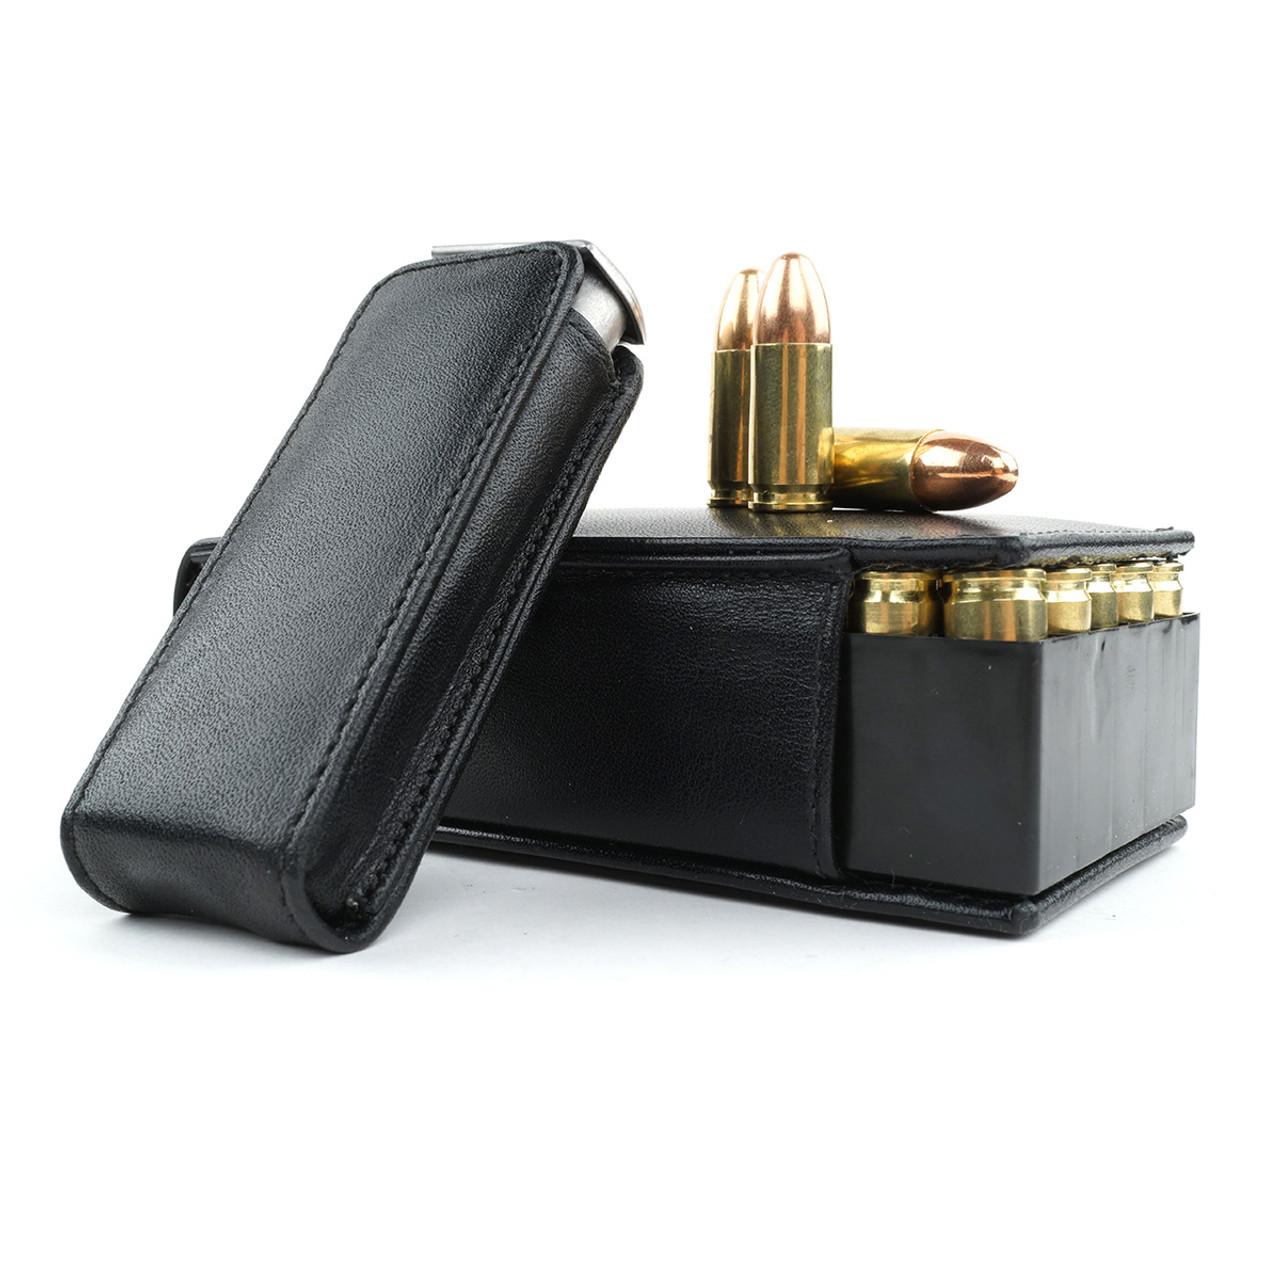 Glock 26 Leather Bullet Brick